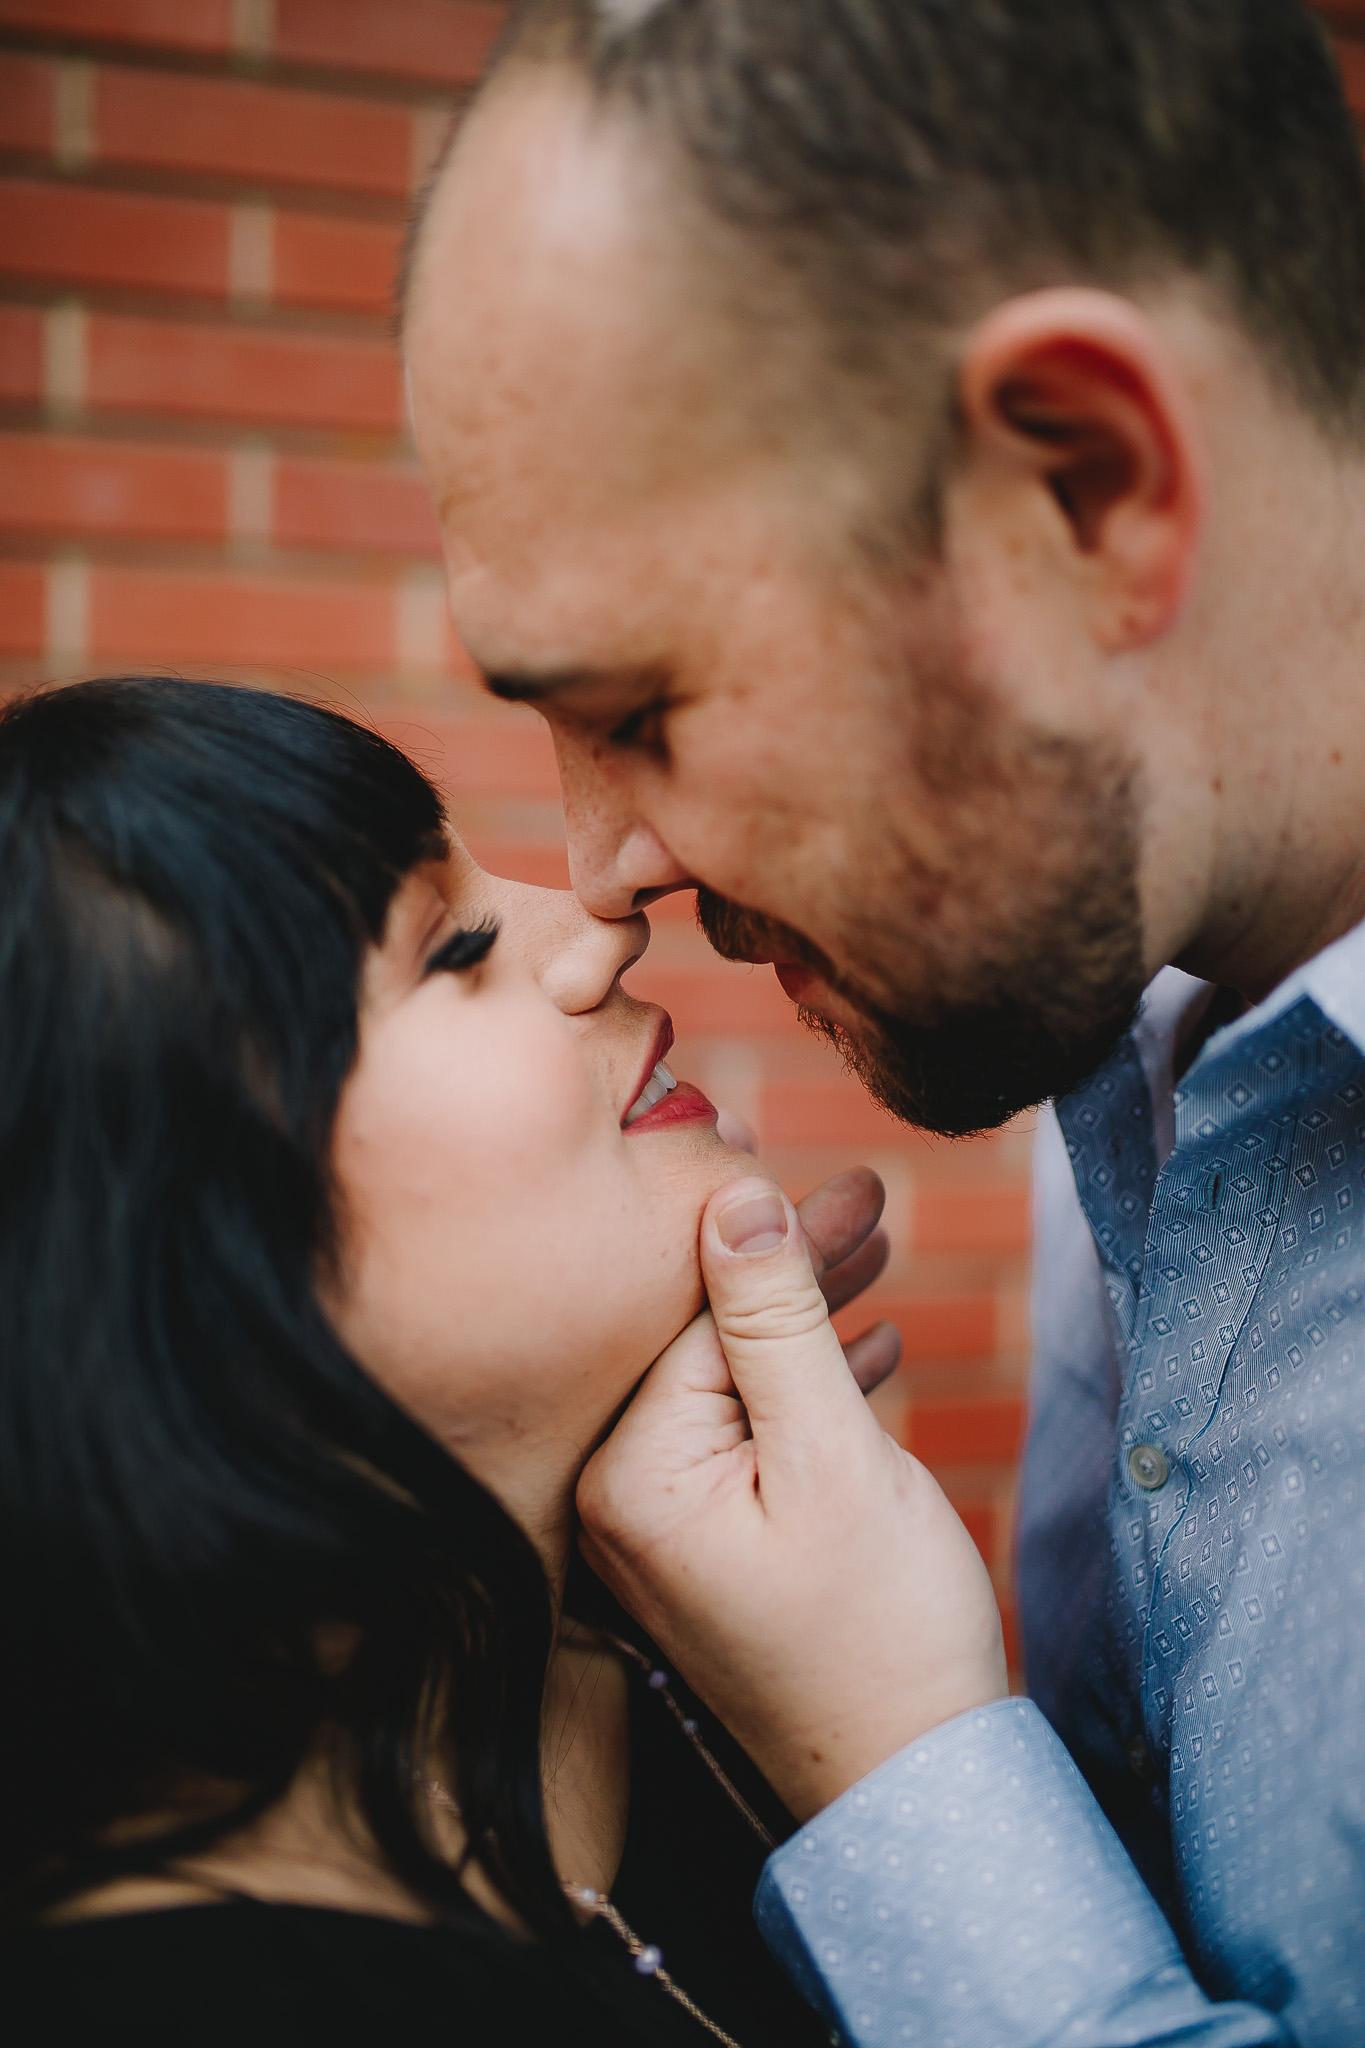 Archer Inspired Photography Gina and Logan Engagement Photos Sacramento California Old Tyme Bookstore Wedding Lifestyle-70.jpg